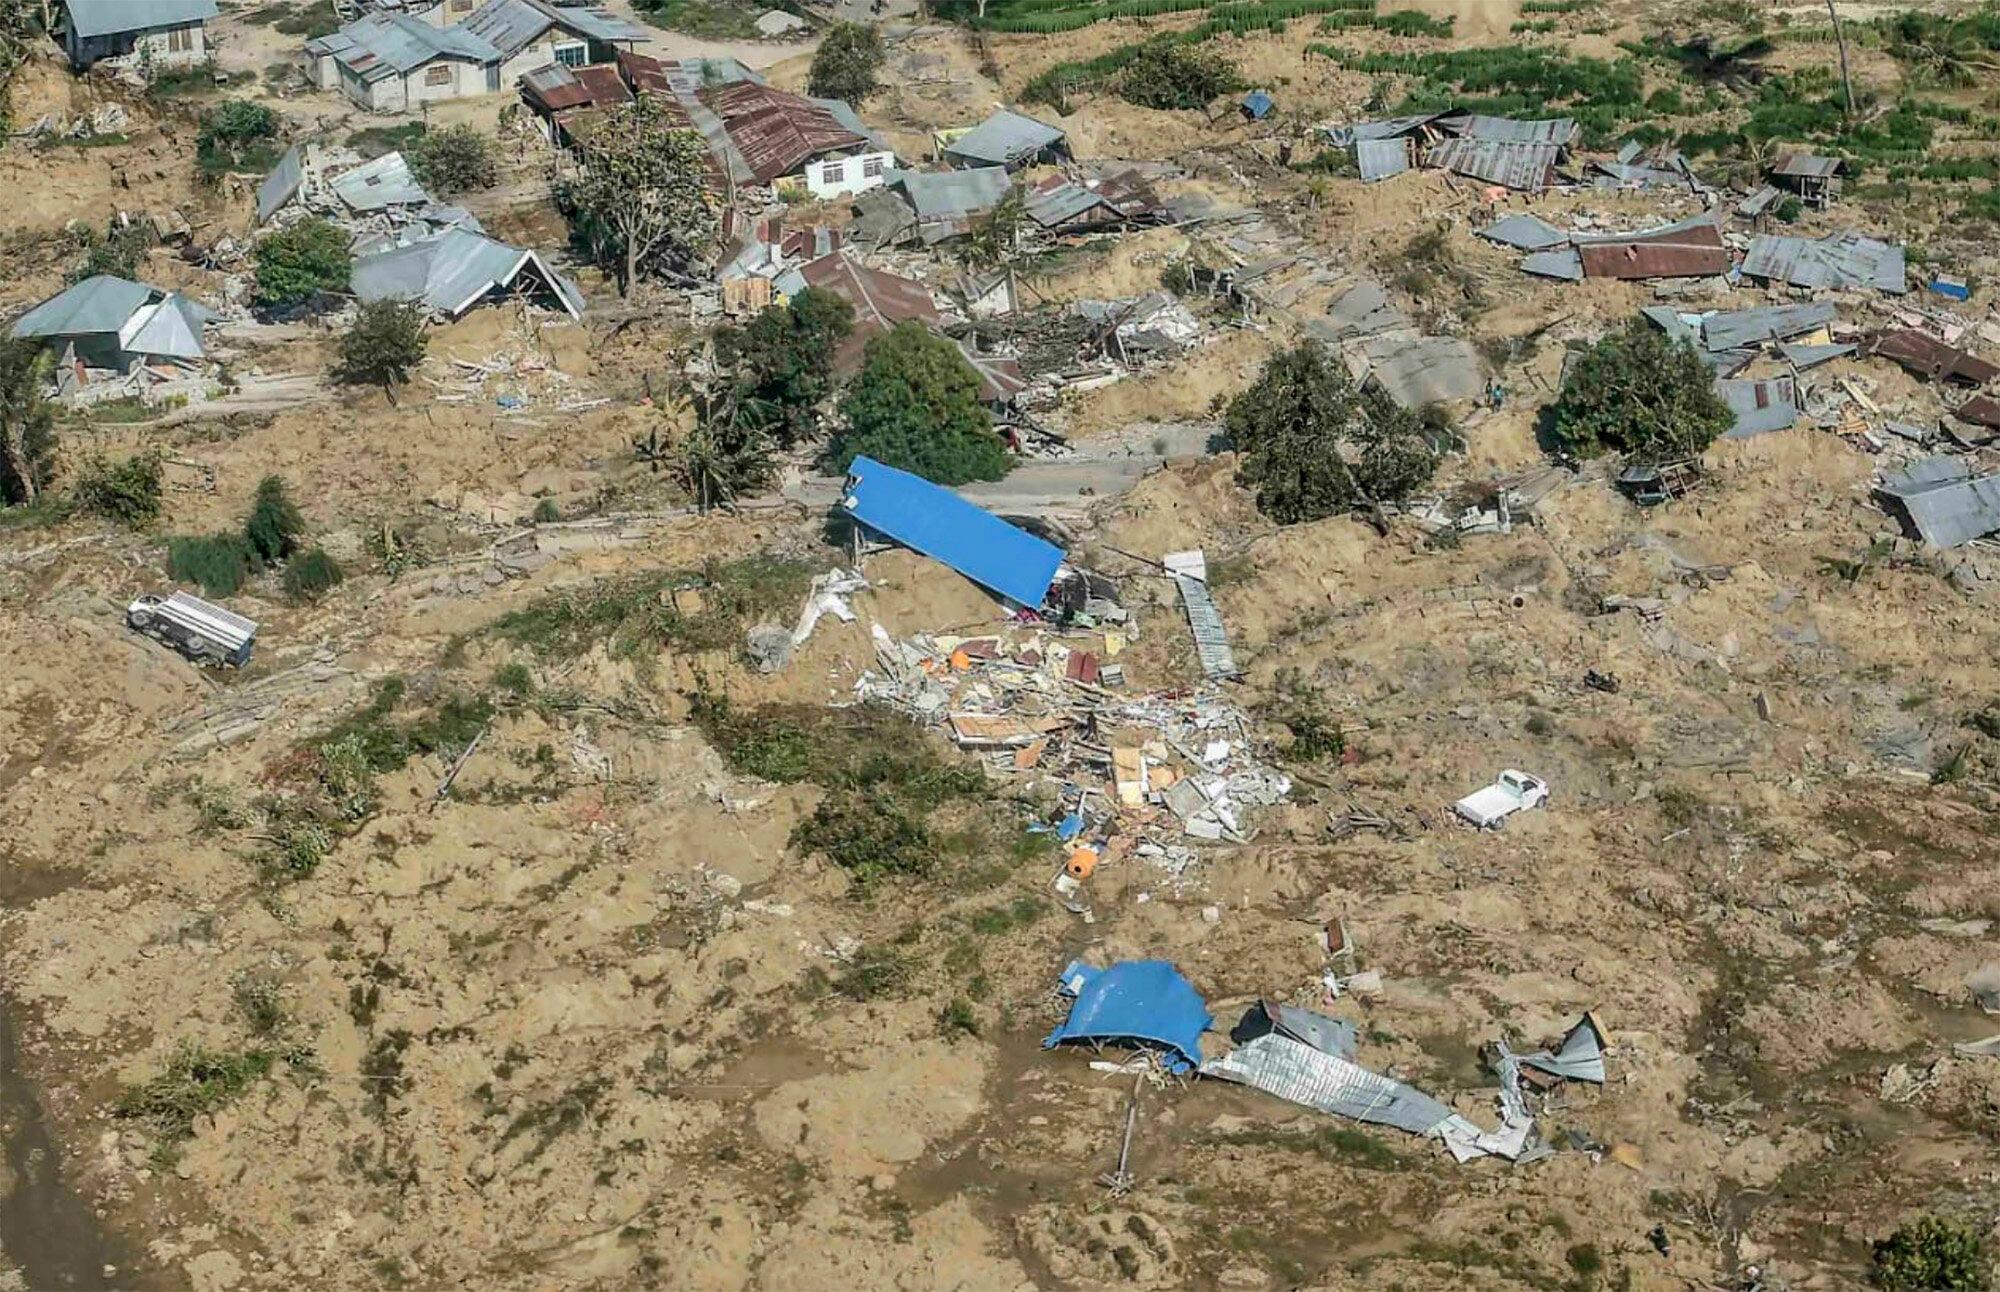 Antara Foto/Muhammad Adimaja via REUTERS | Authorities on Sunday announced it would start mass burials in order to avoid the spread of disease.